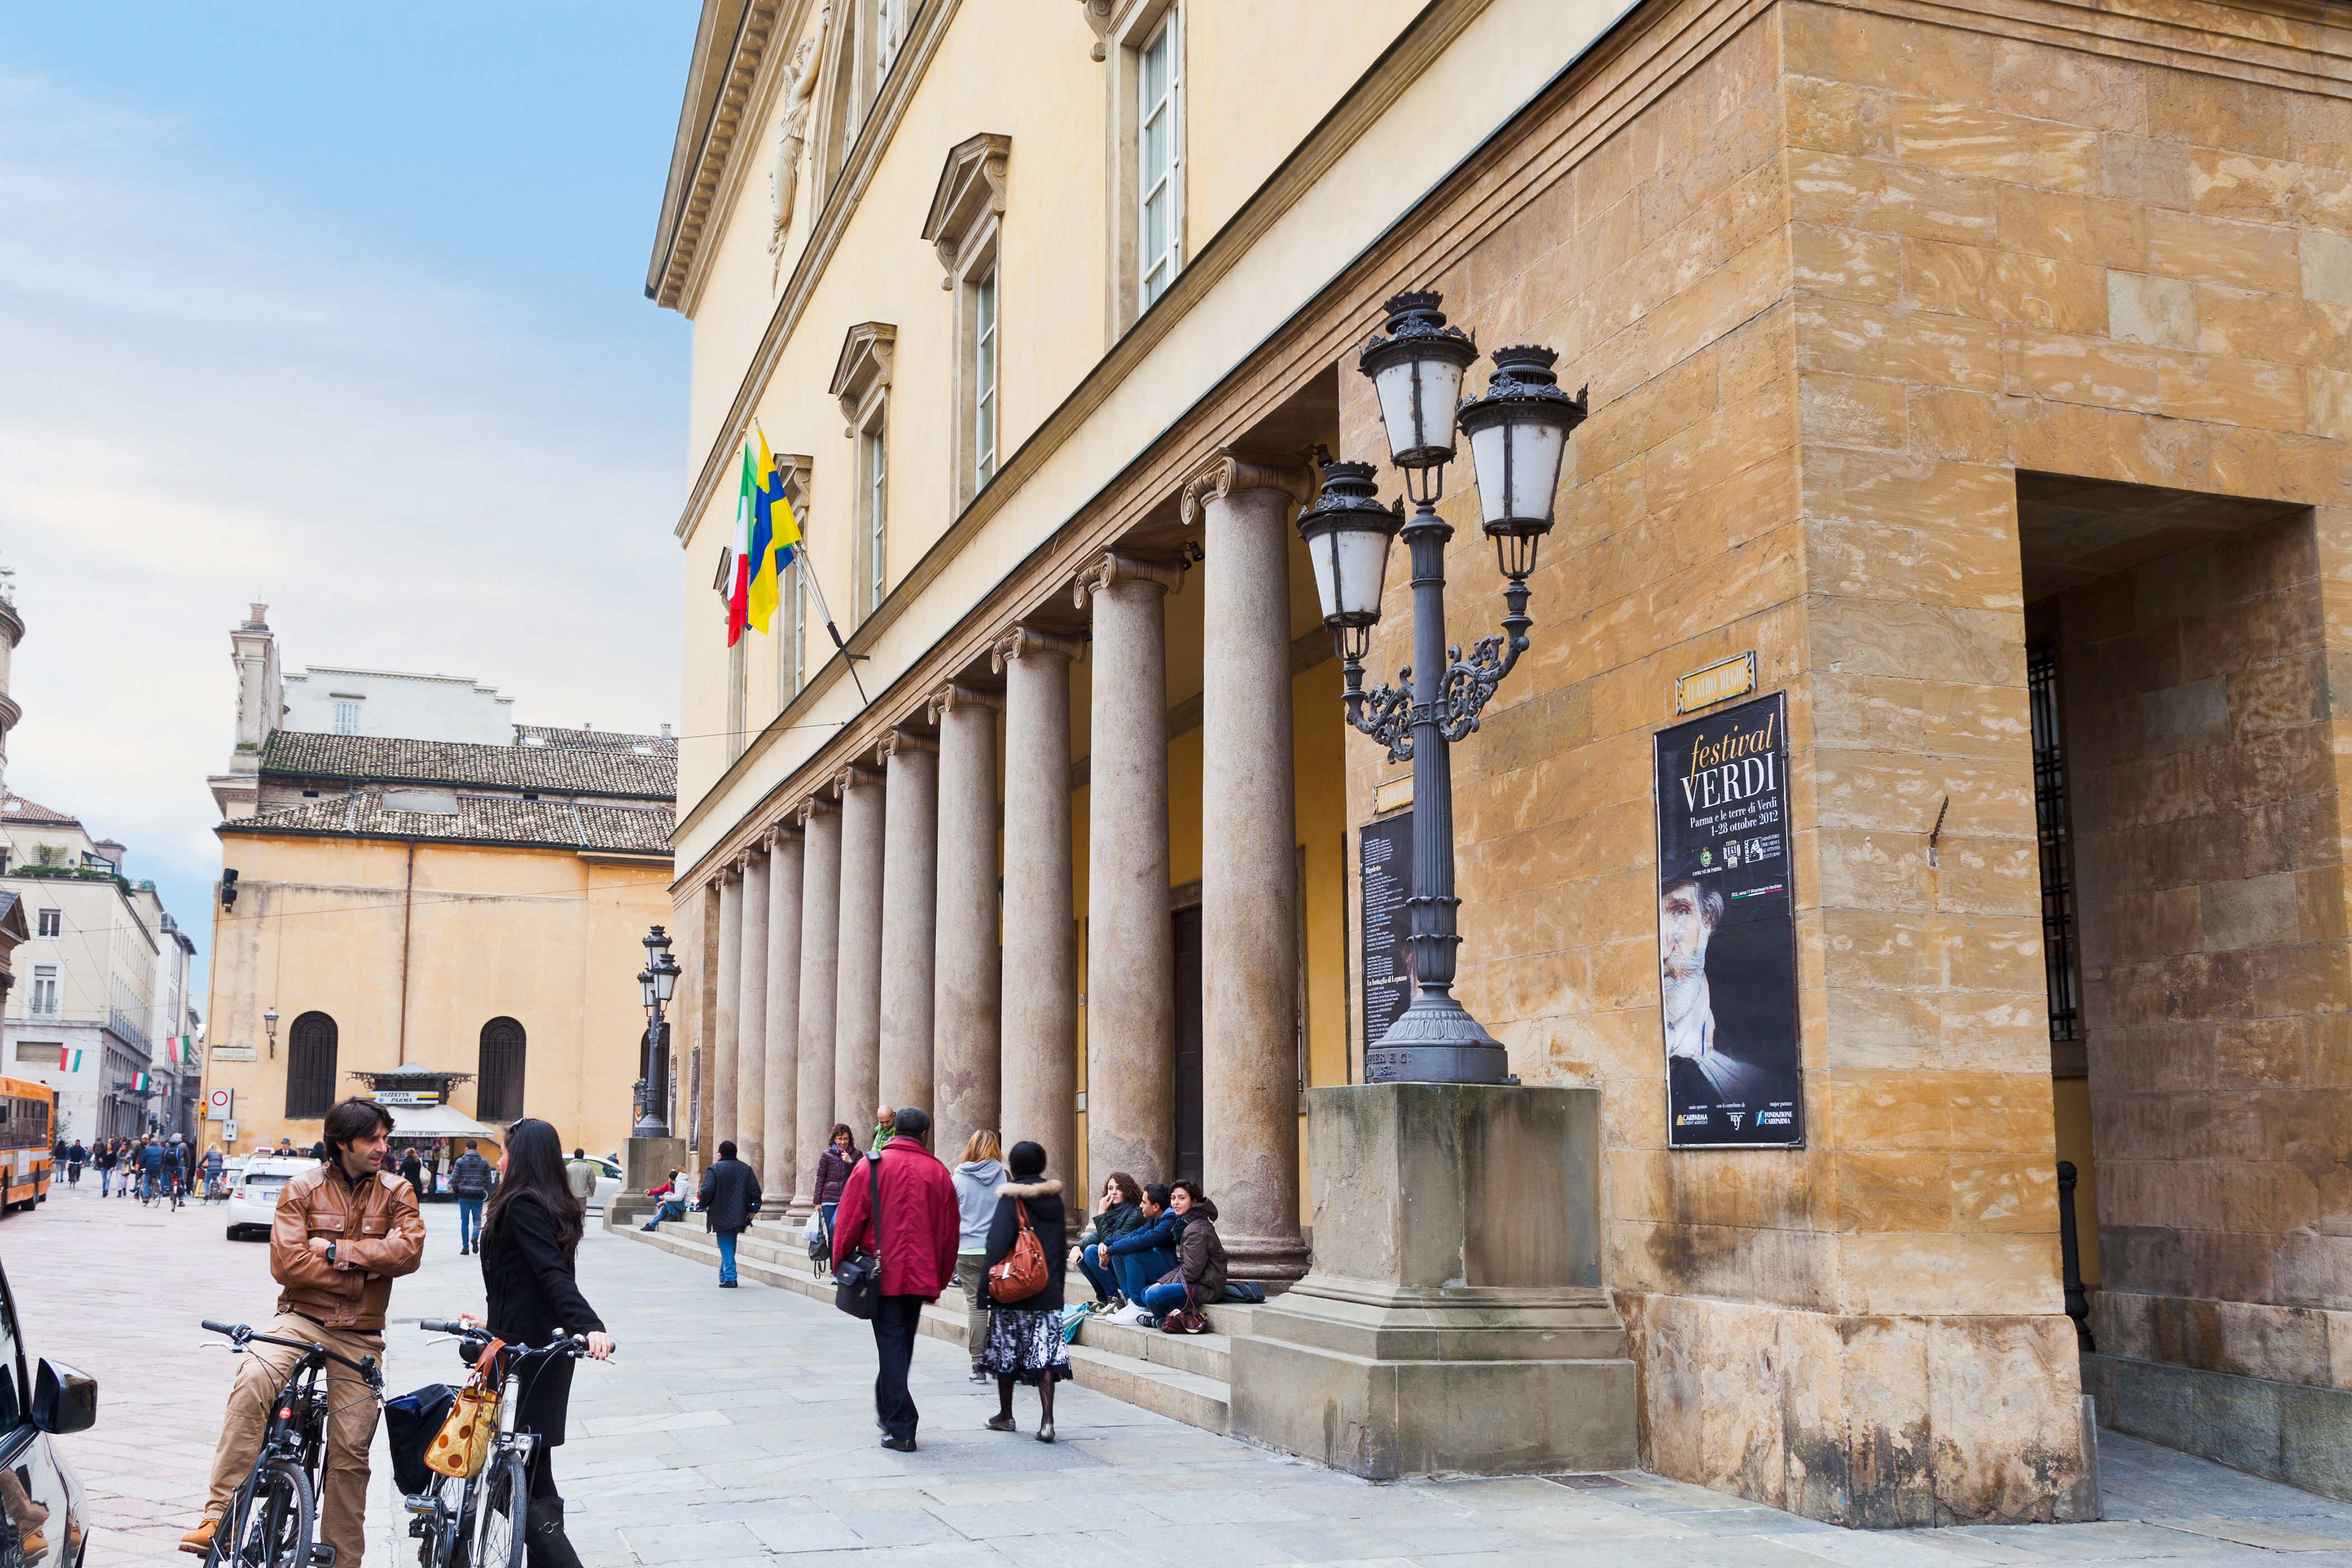 colonnade Teatro of Regio di Parma - opera house